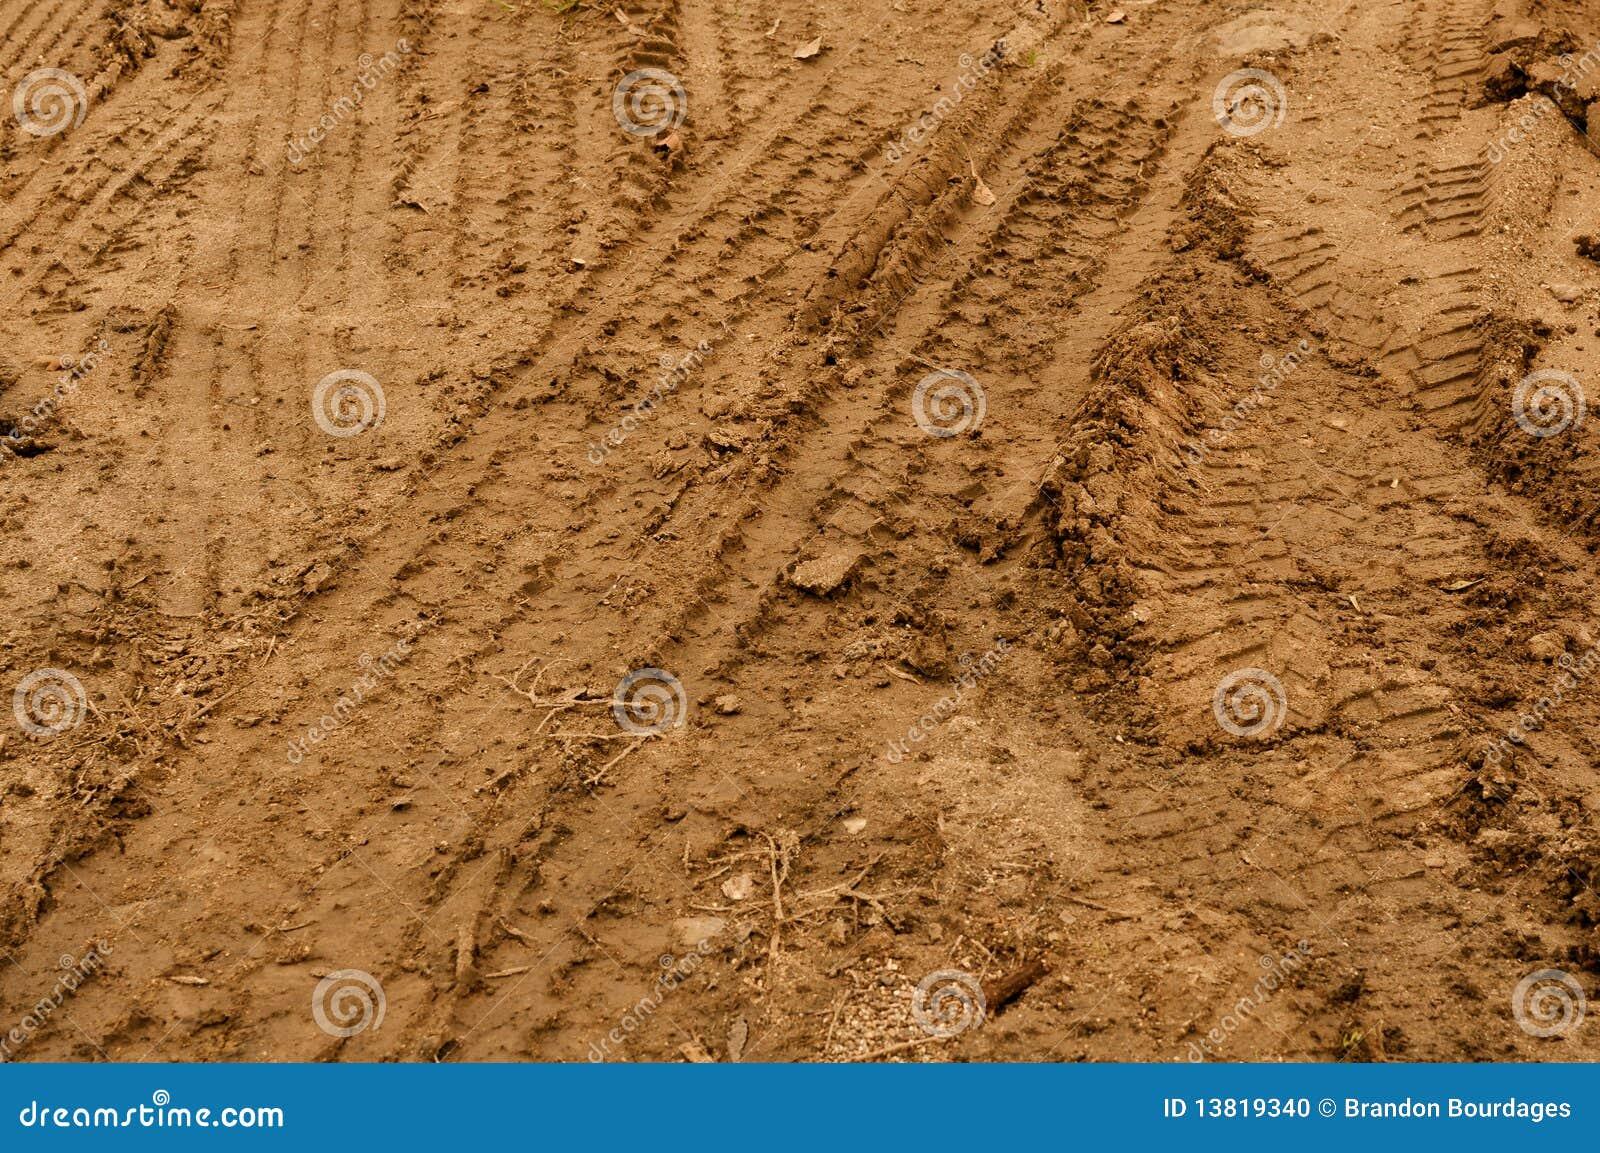 Mud Tire Tracks Truck Tire Tracks in Mud